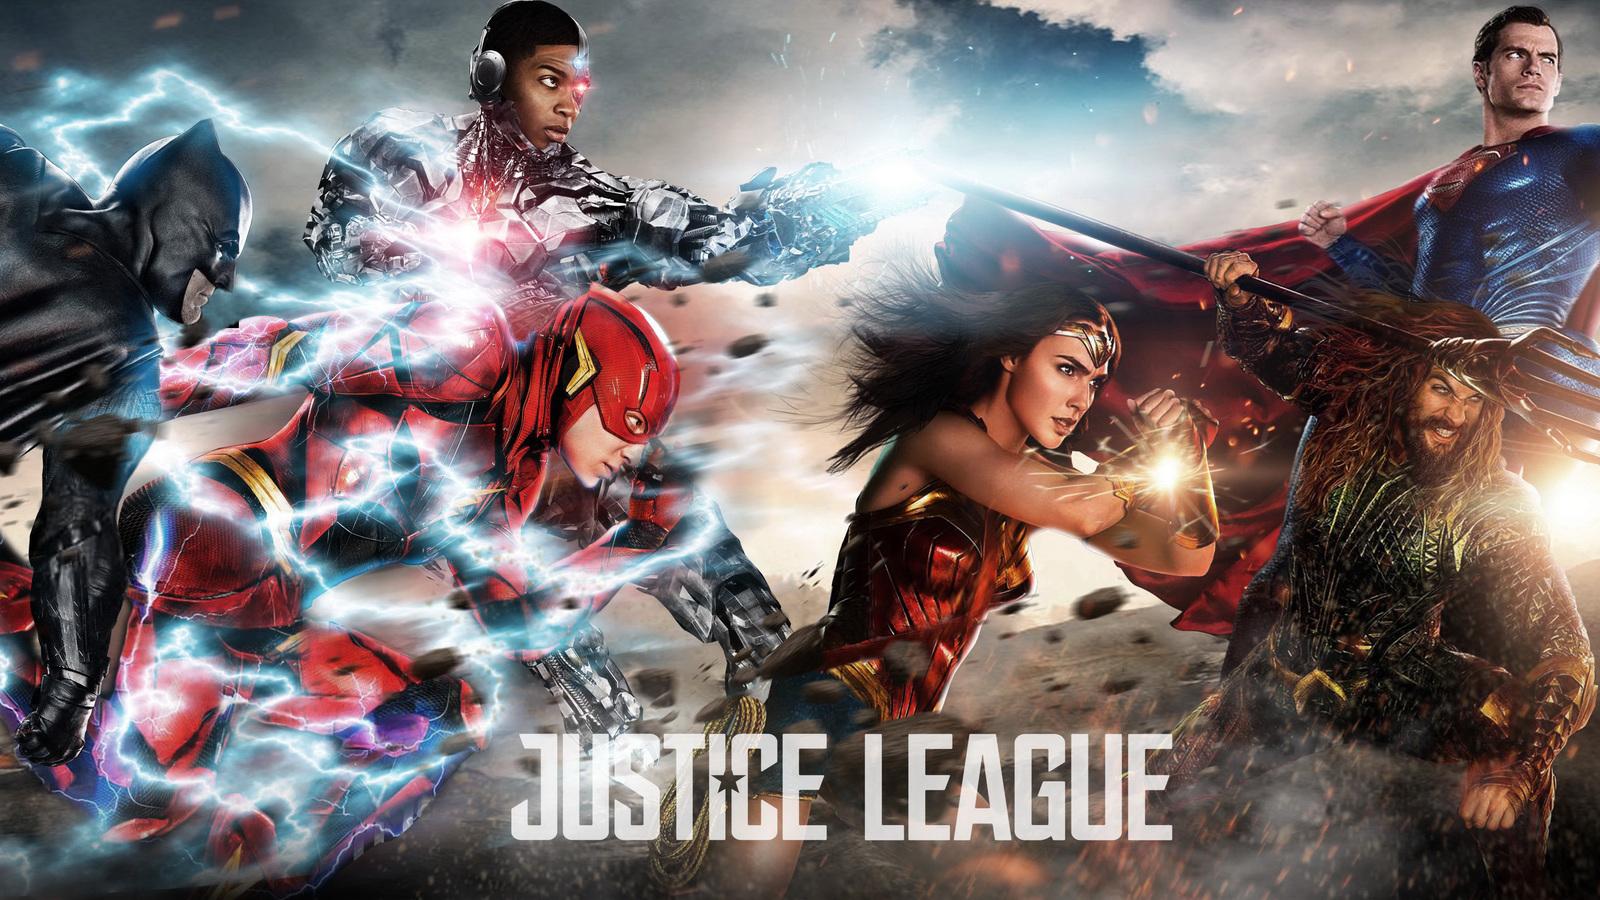 Sau 3 năm, Justice League bất ngờ hồi sinh khiến fan DCEU vui mừng